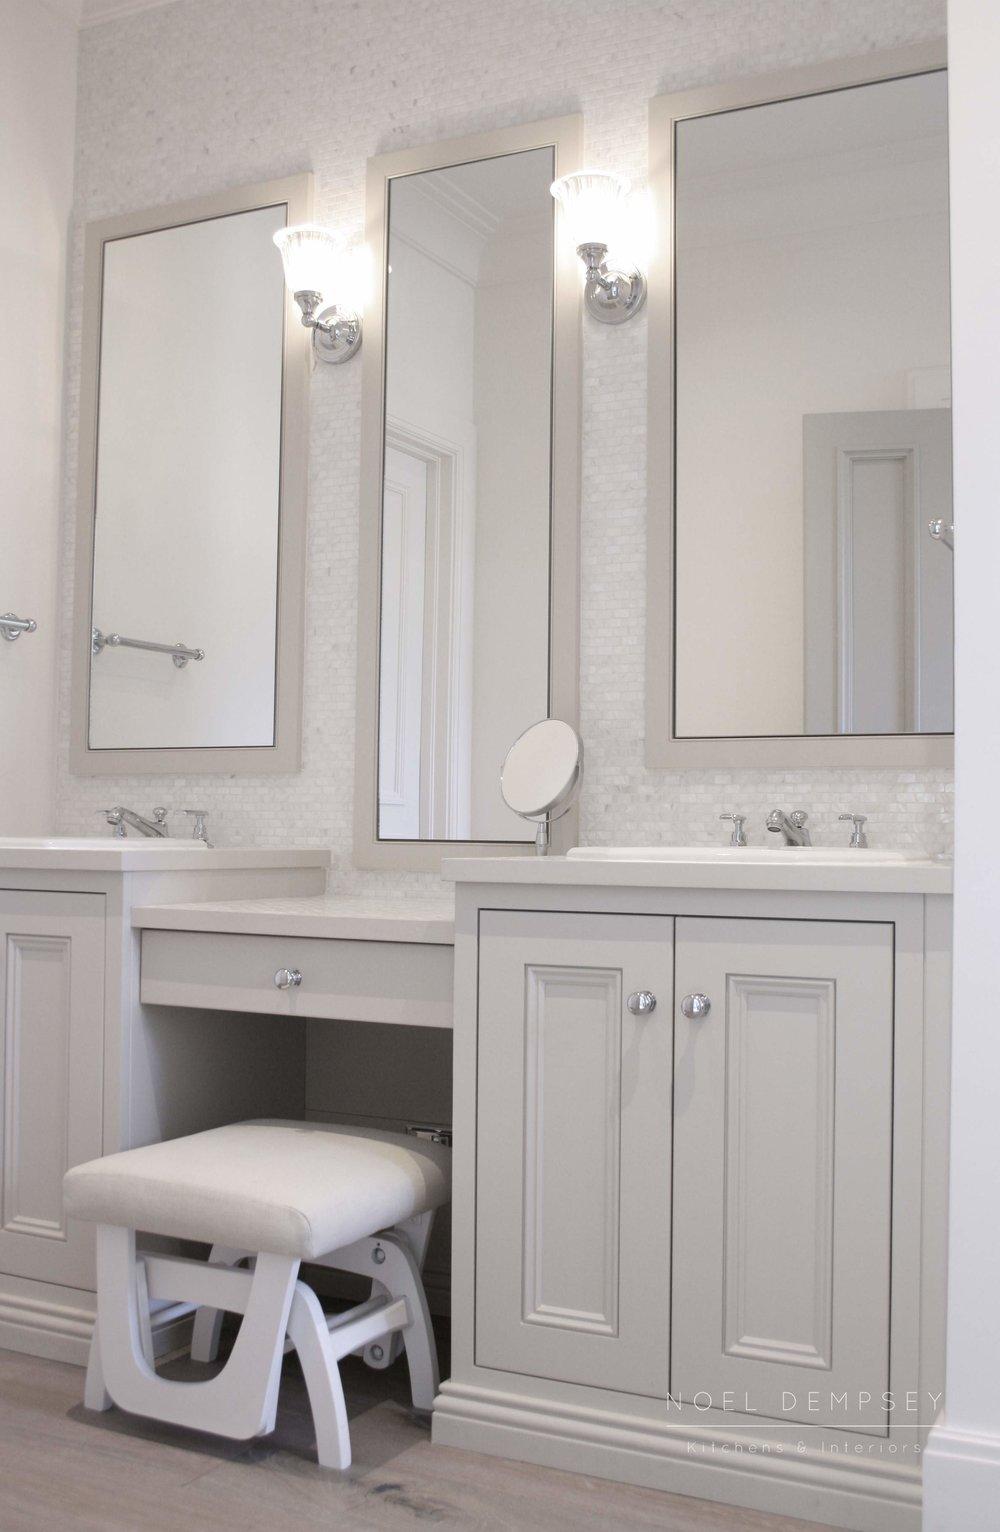 Mirrors design Noel Dempsey